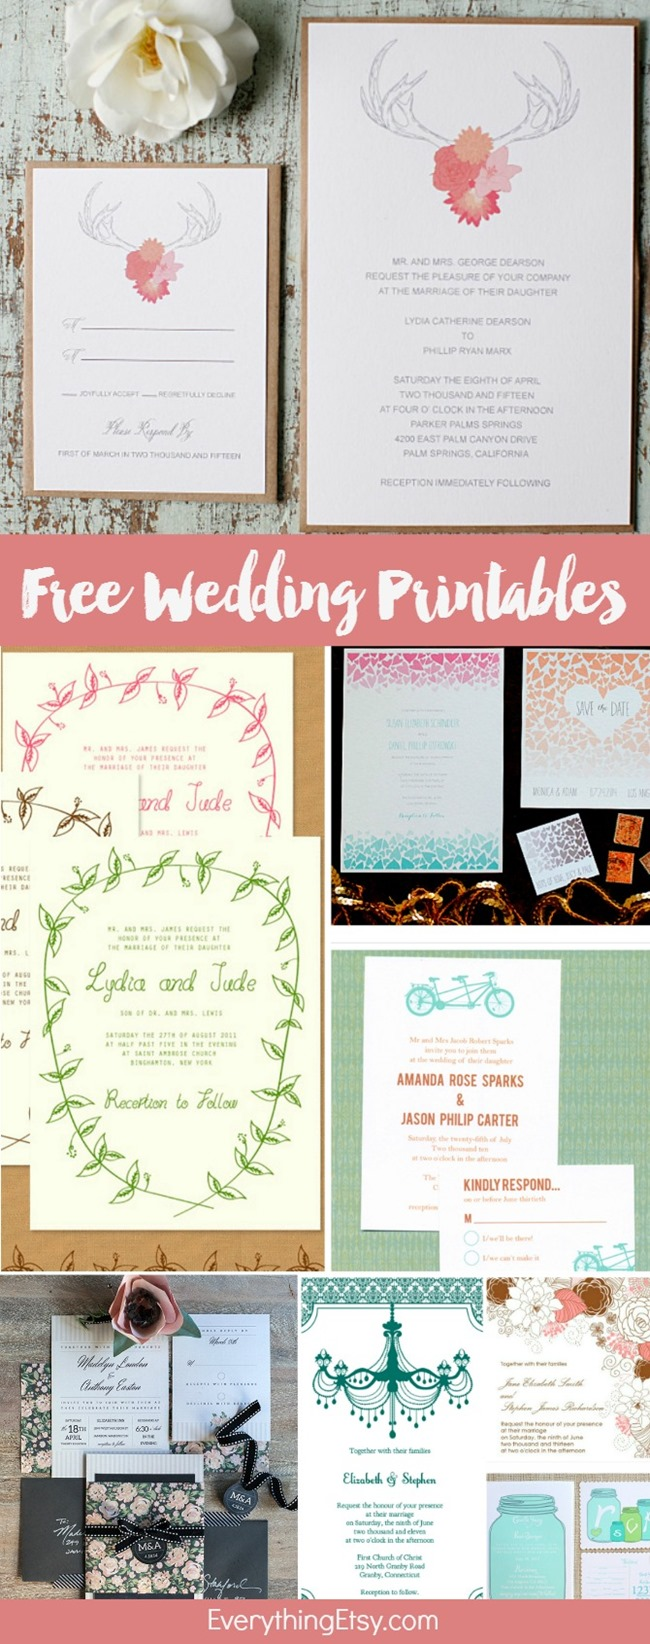 Free Wedding Printables - Invitations - DIY Weddings on EverythingEtsy.com